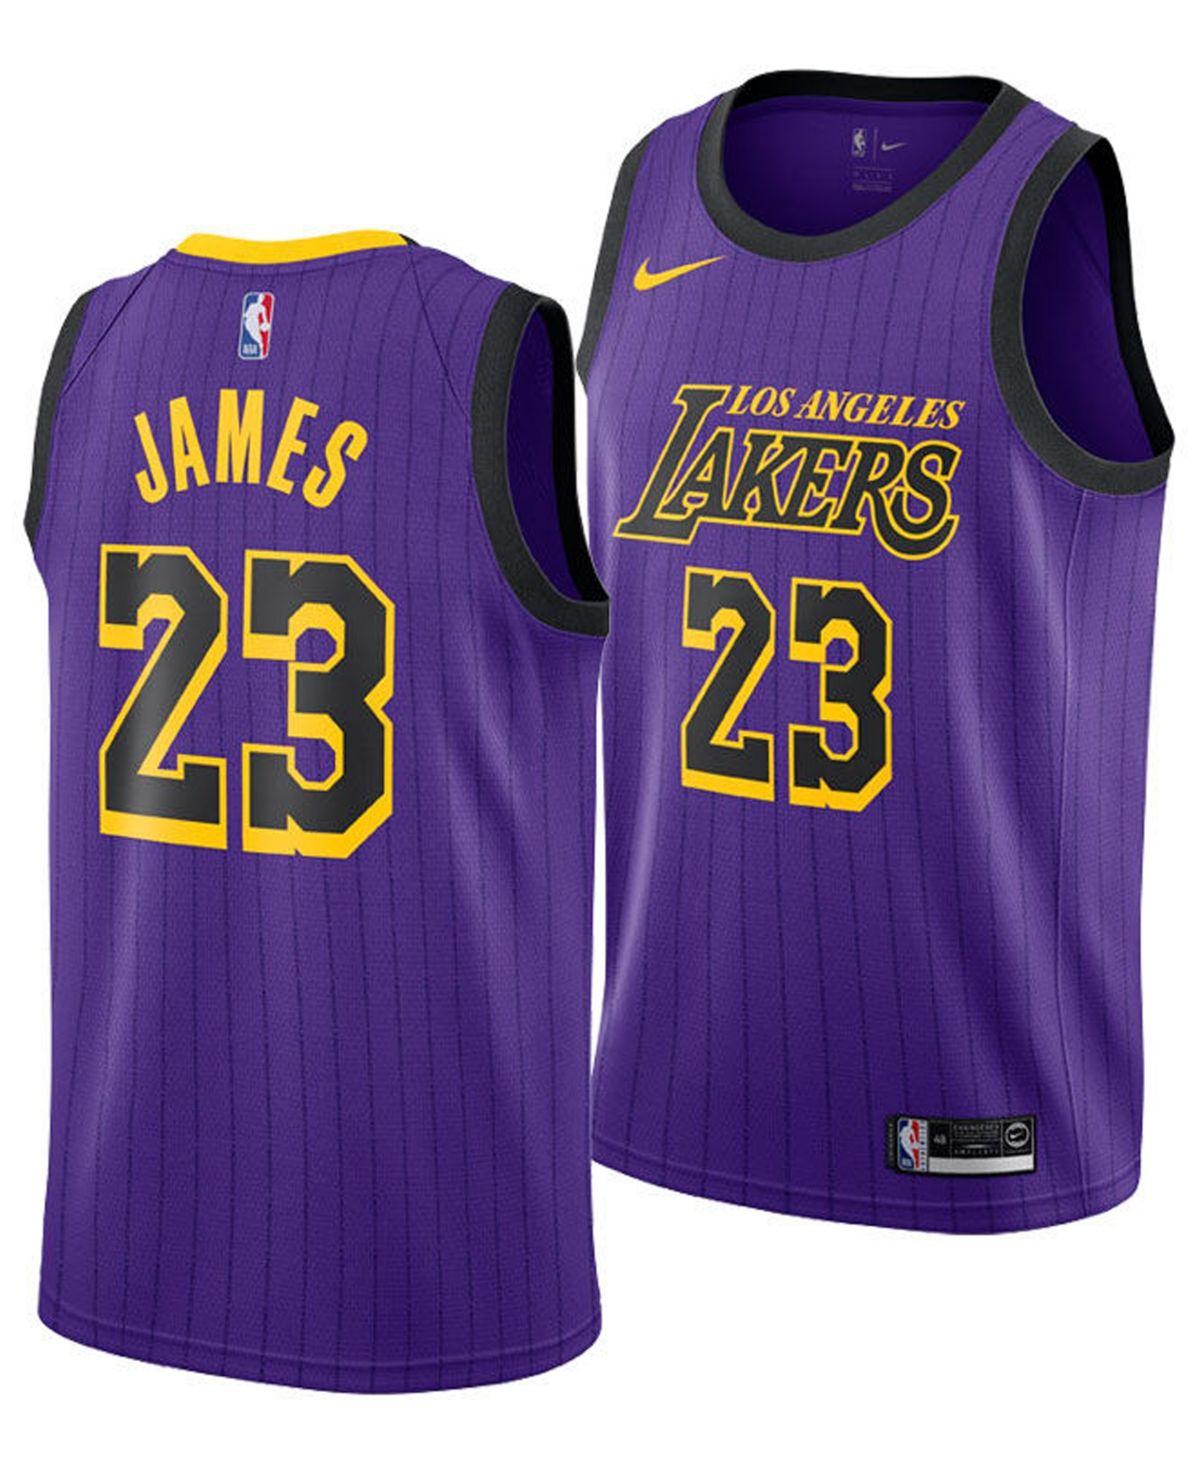 Nike Men S Lebron James Los Angeles Lakers City Swingman Jersey 2018 Reviews Sports Fan Shop By Lids Men Macy S In 2020 Sport Outfit Men Los Angeles Lakers Nike Men